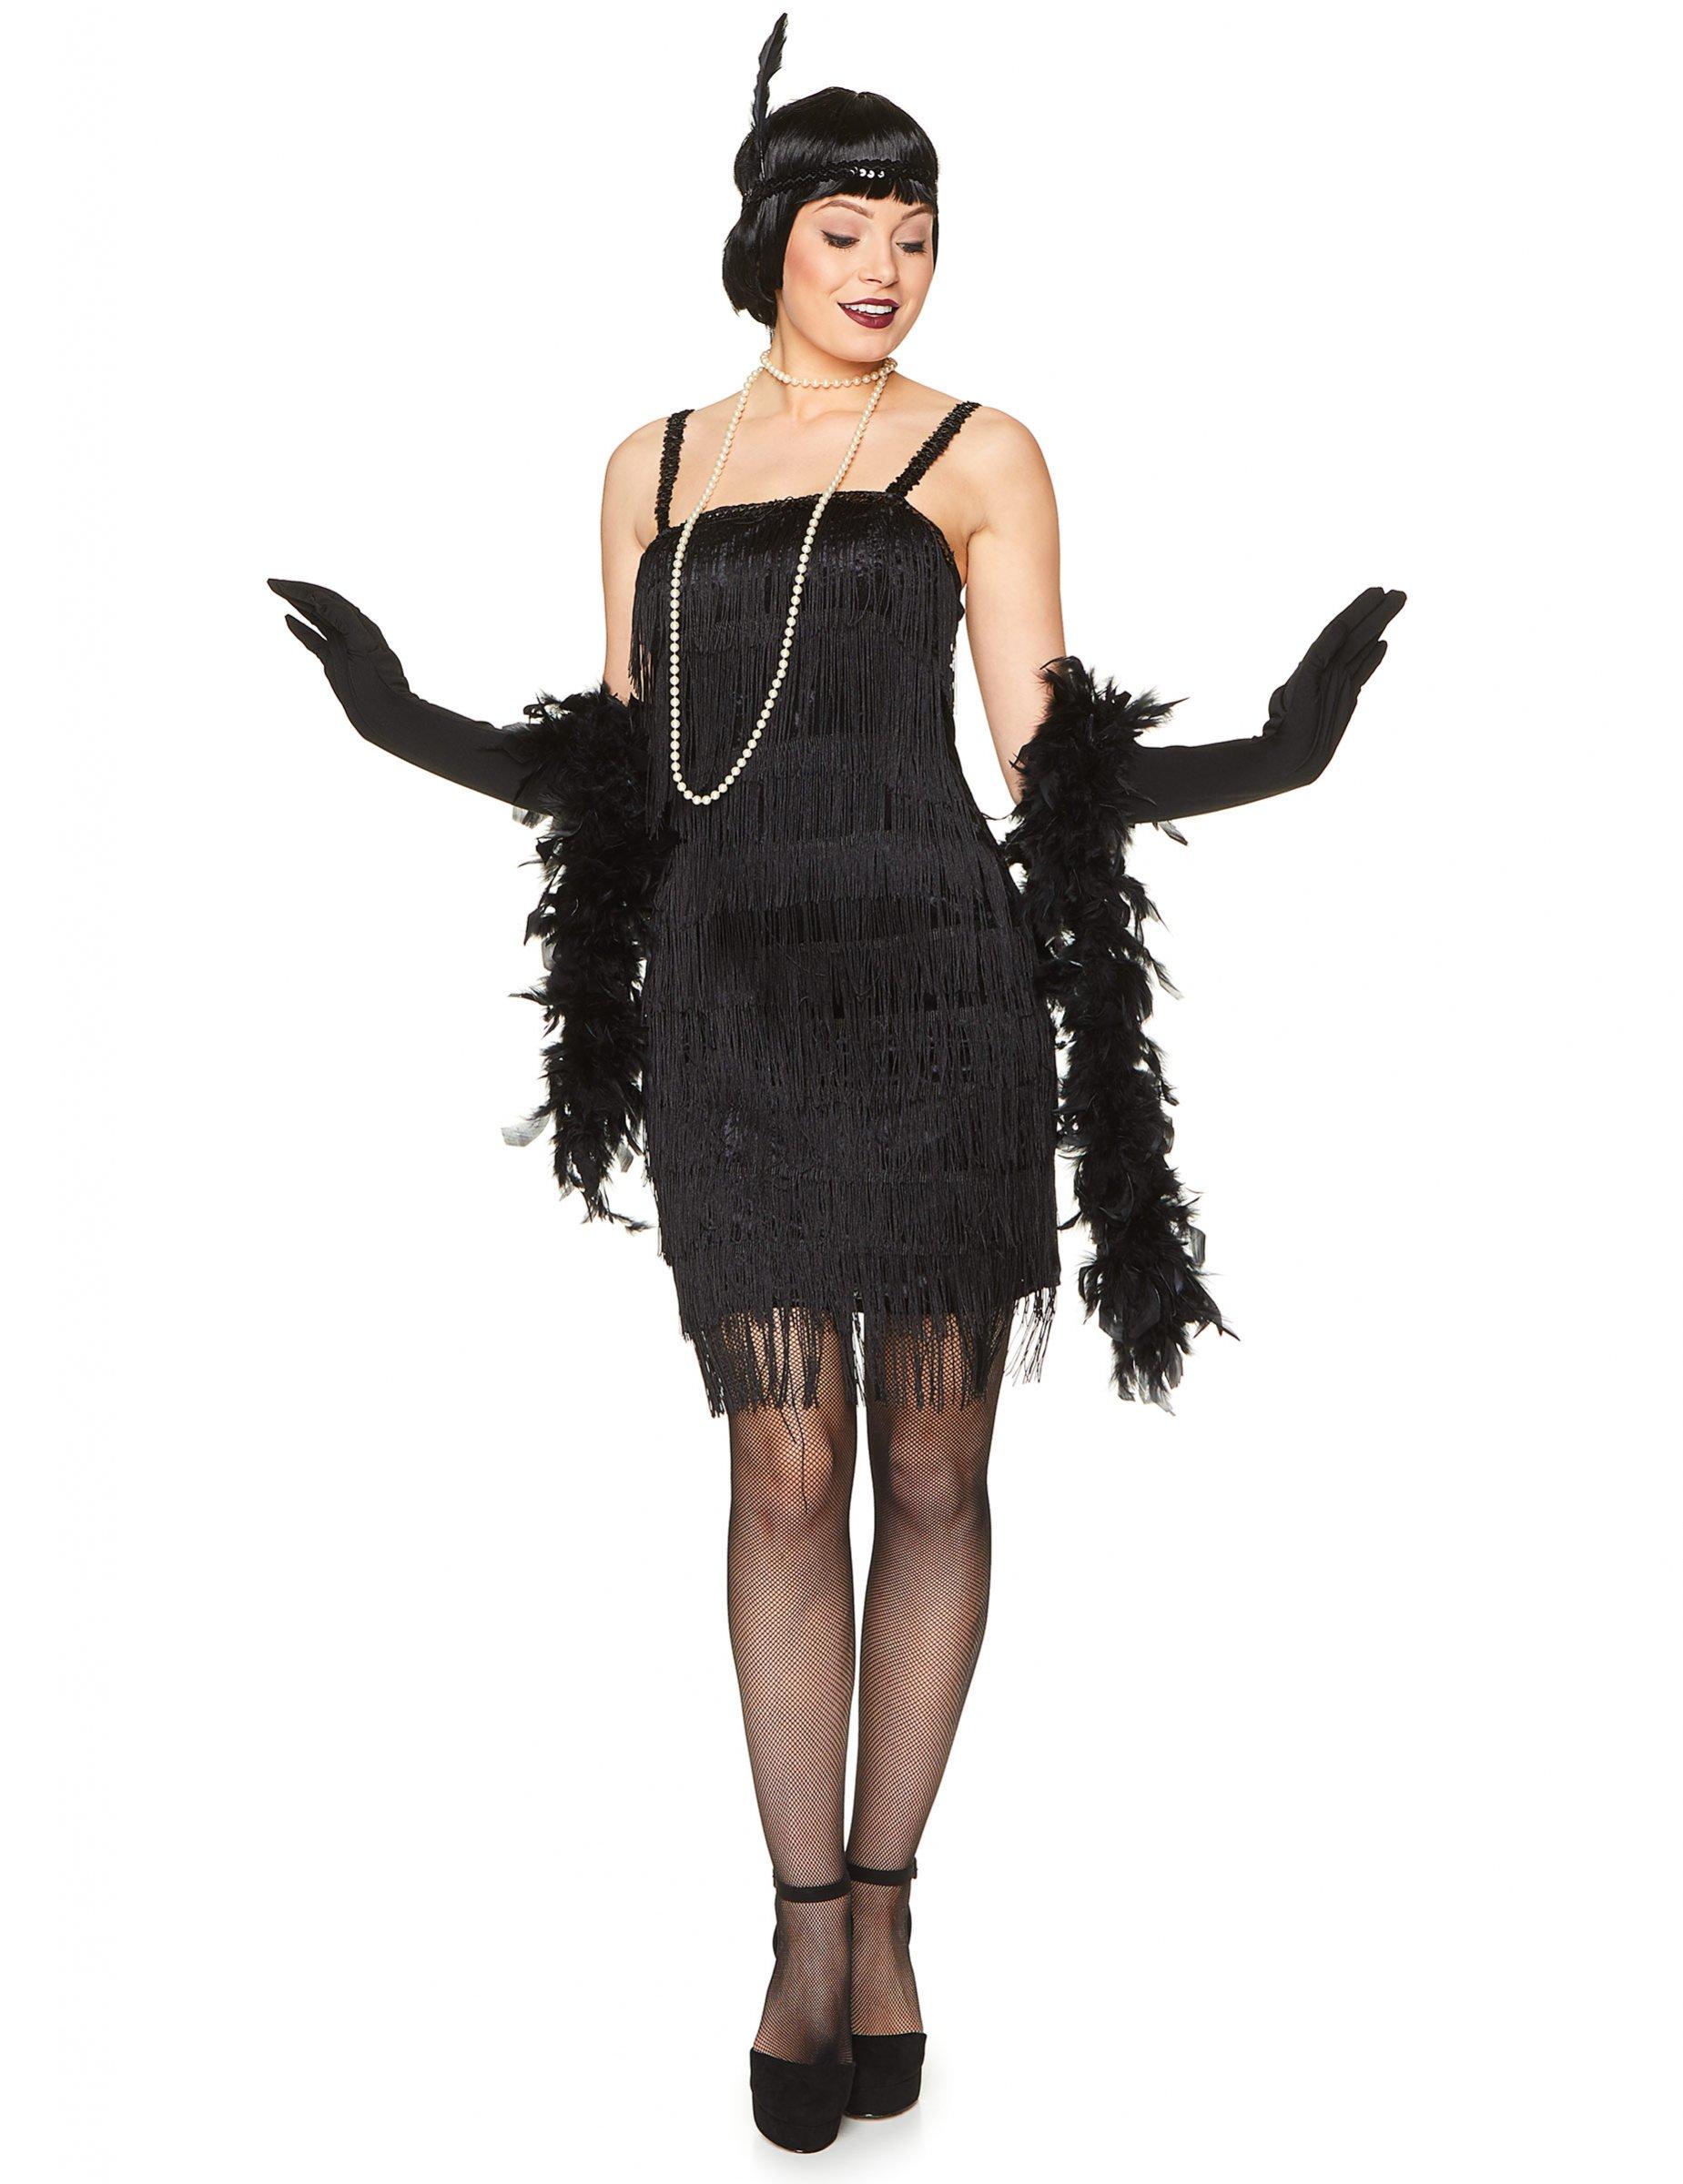 Vestiti di Carnevale donna a prezzi da urlo - Vegaoo.it fb8aeaf26eb